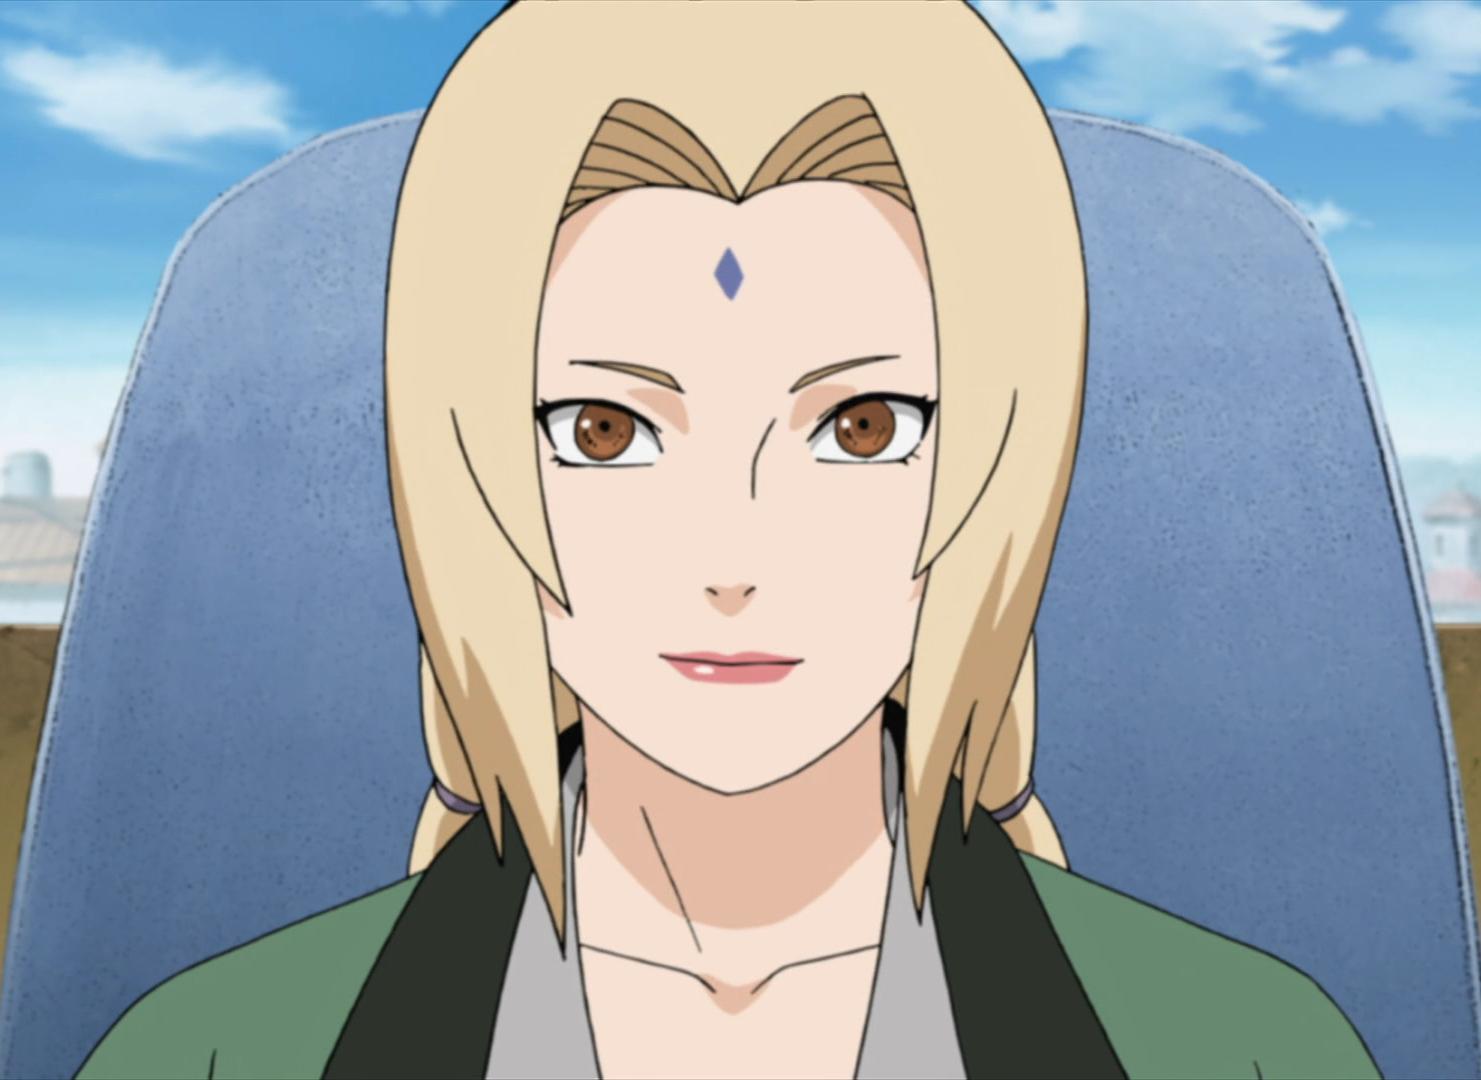 sera Naruto brancher avec Hinata datant de l'ennemi torrent 1996